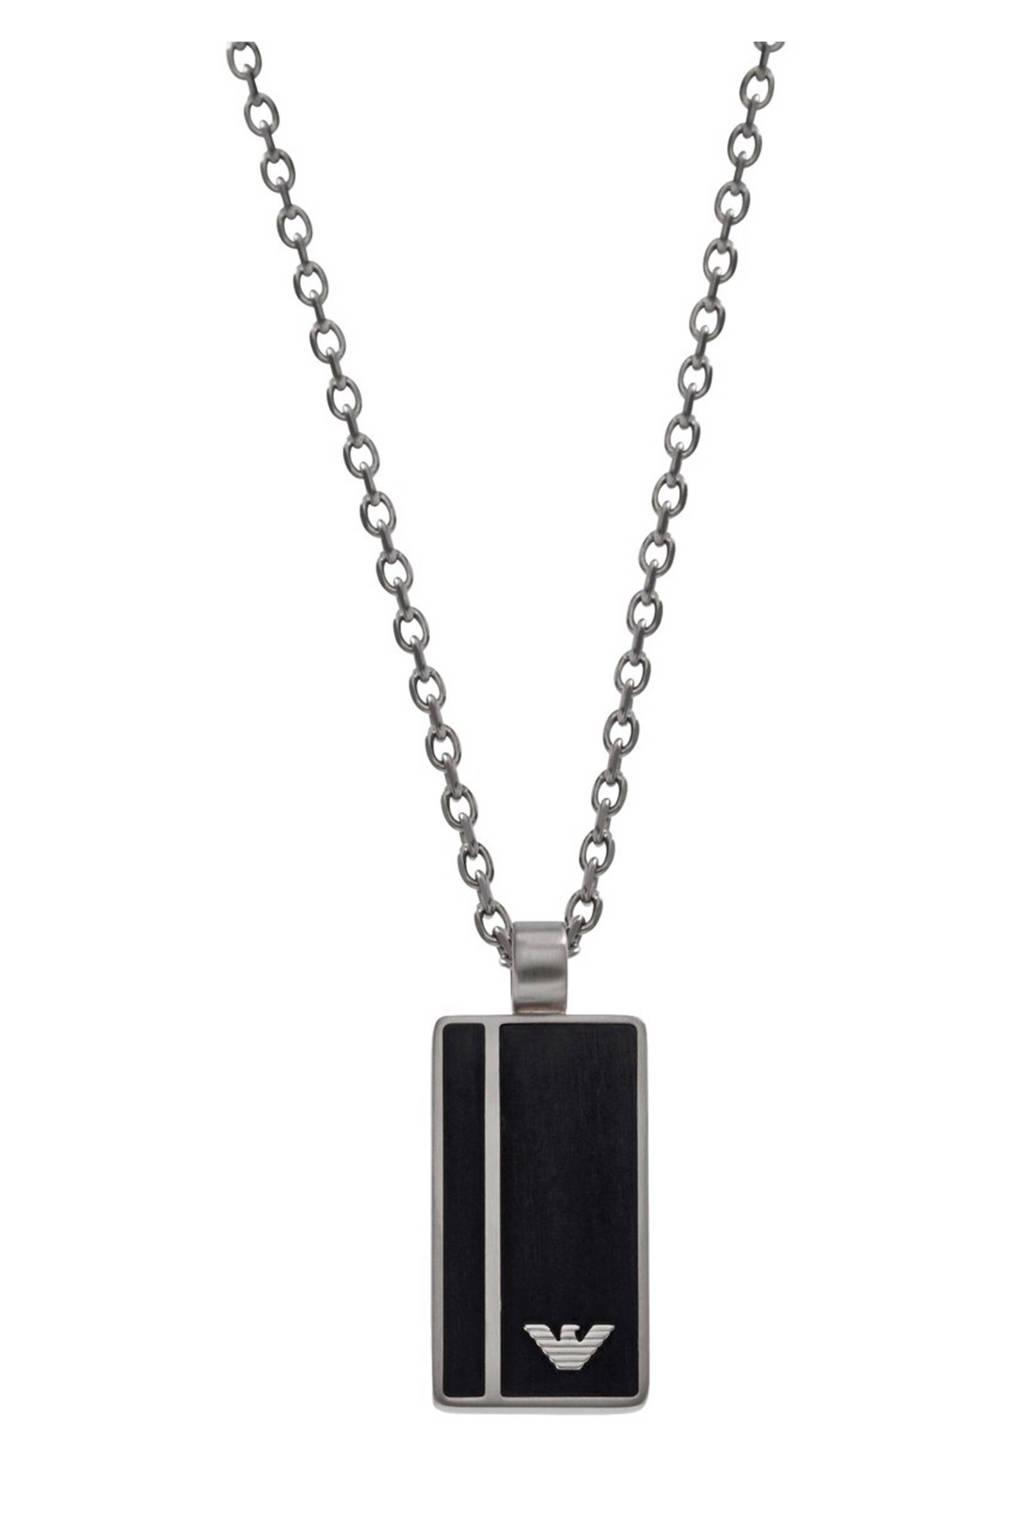 Emporio Armani ketting - EGS2031040, Zilver/zwart